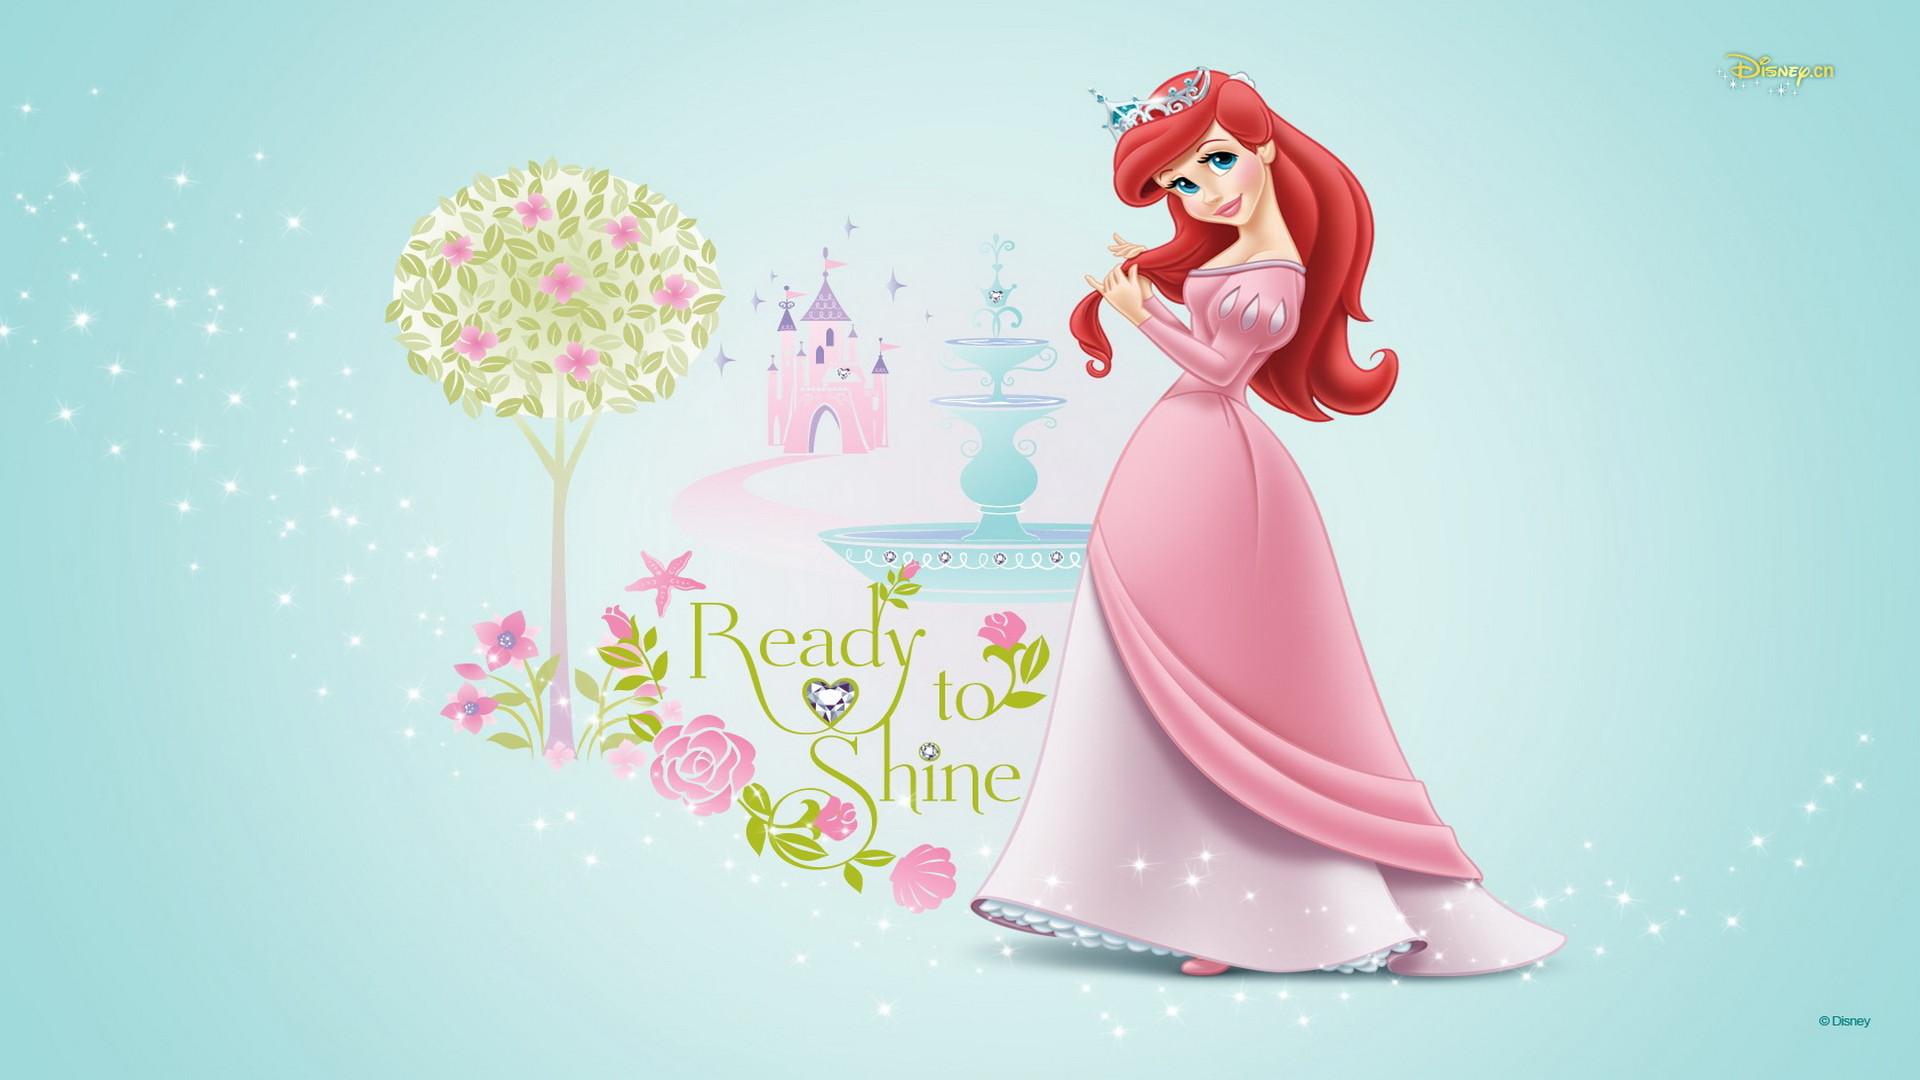 Disney Princess Wallpapers Quality Disney Princess HD Images